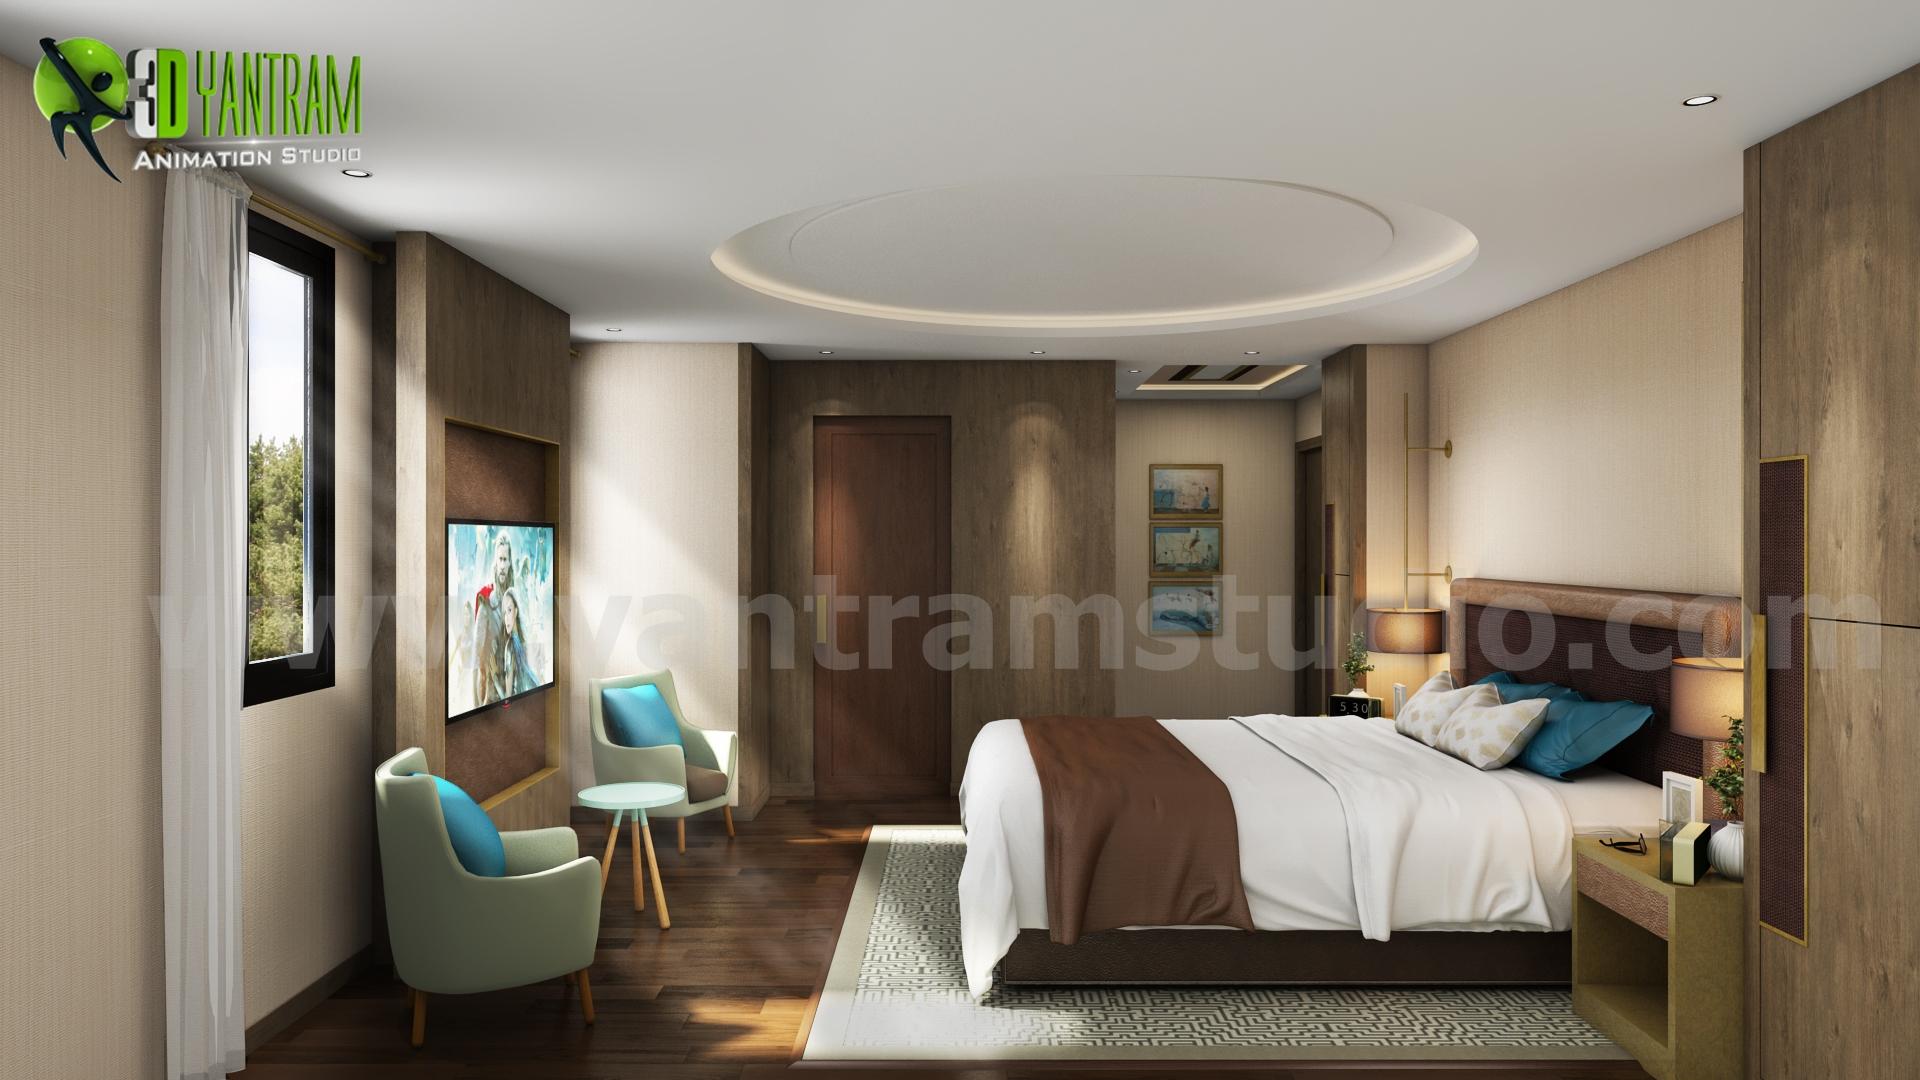 Beau Yantram Studio | 3D Architectural Rendering